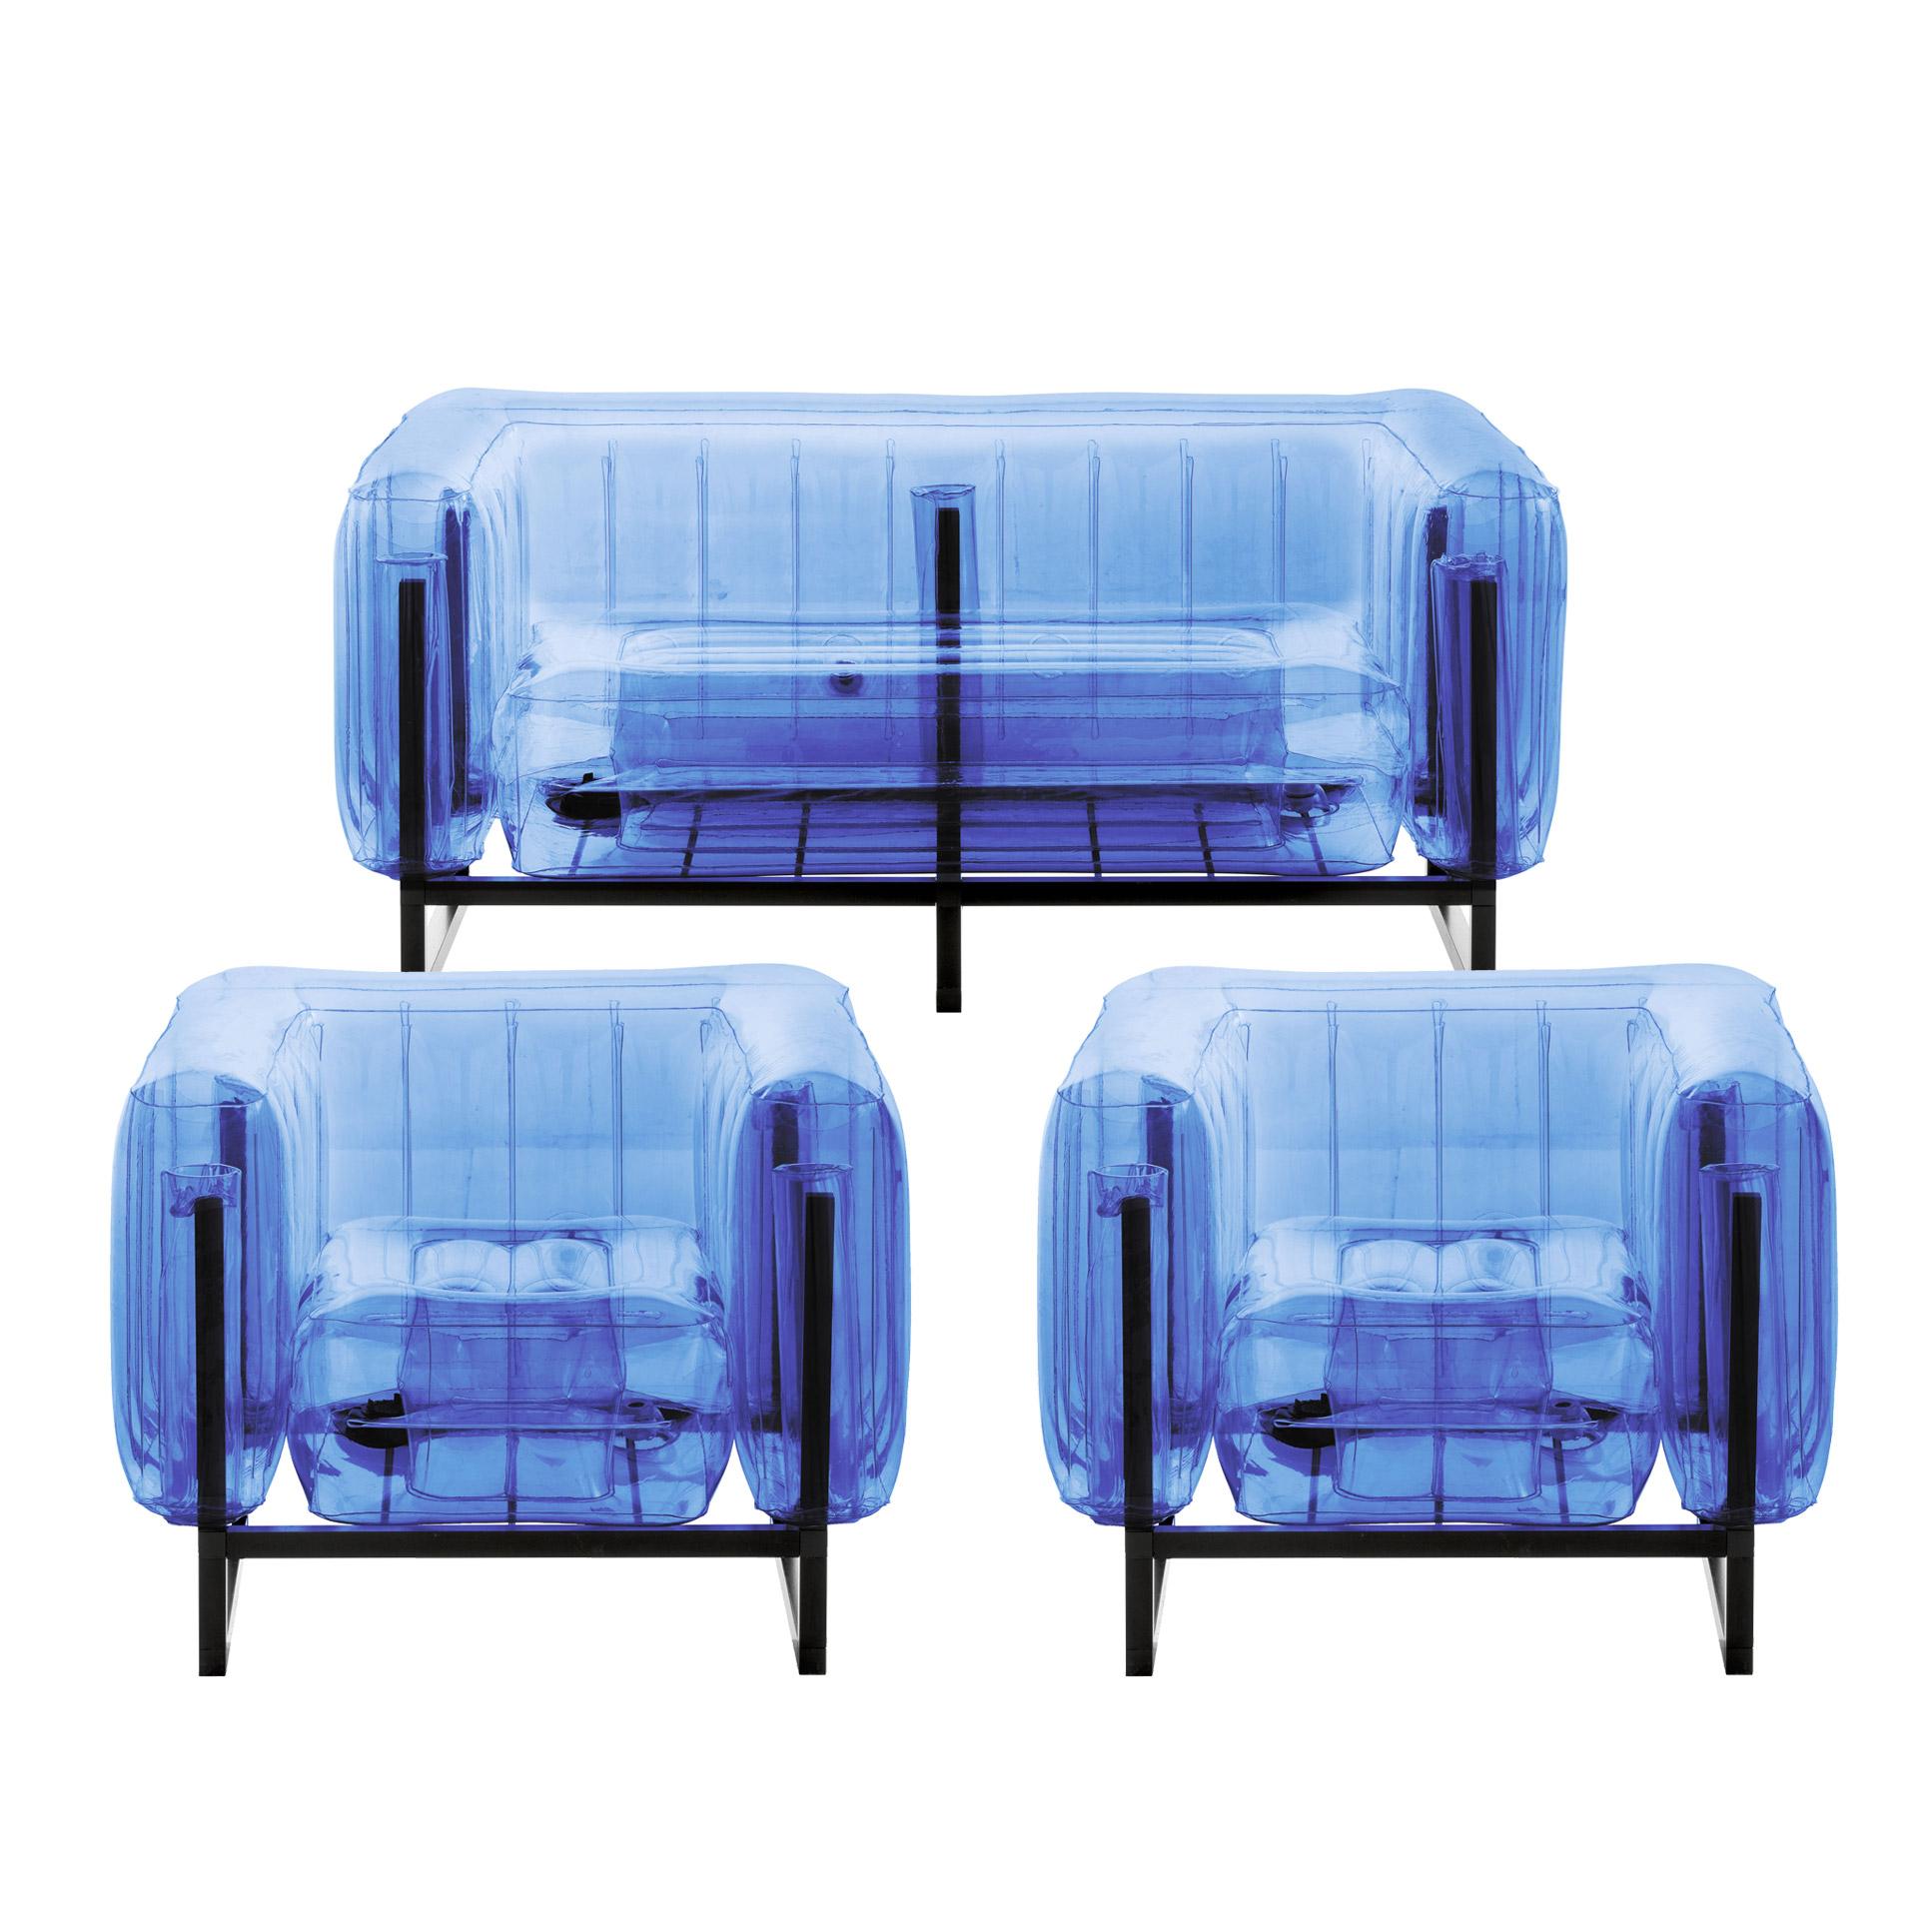 Salon de jardin design 1 canapé et 2 fauteuils bleus cadre aluminium